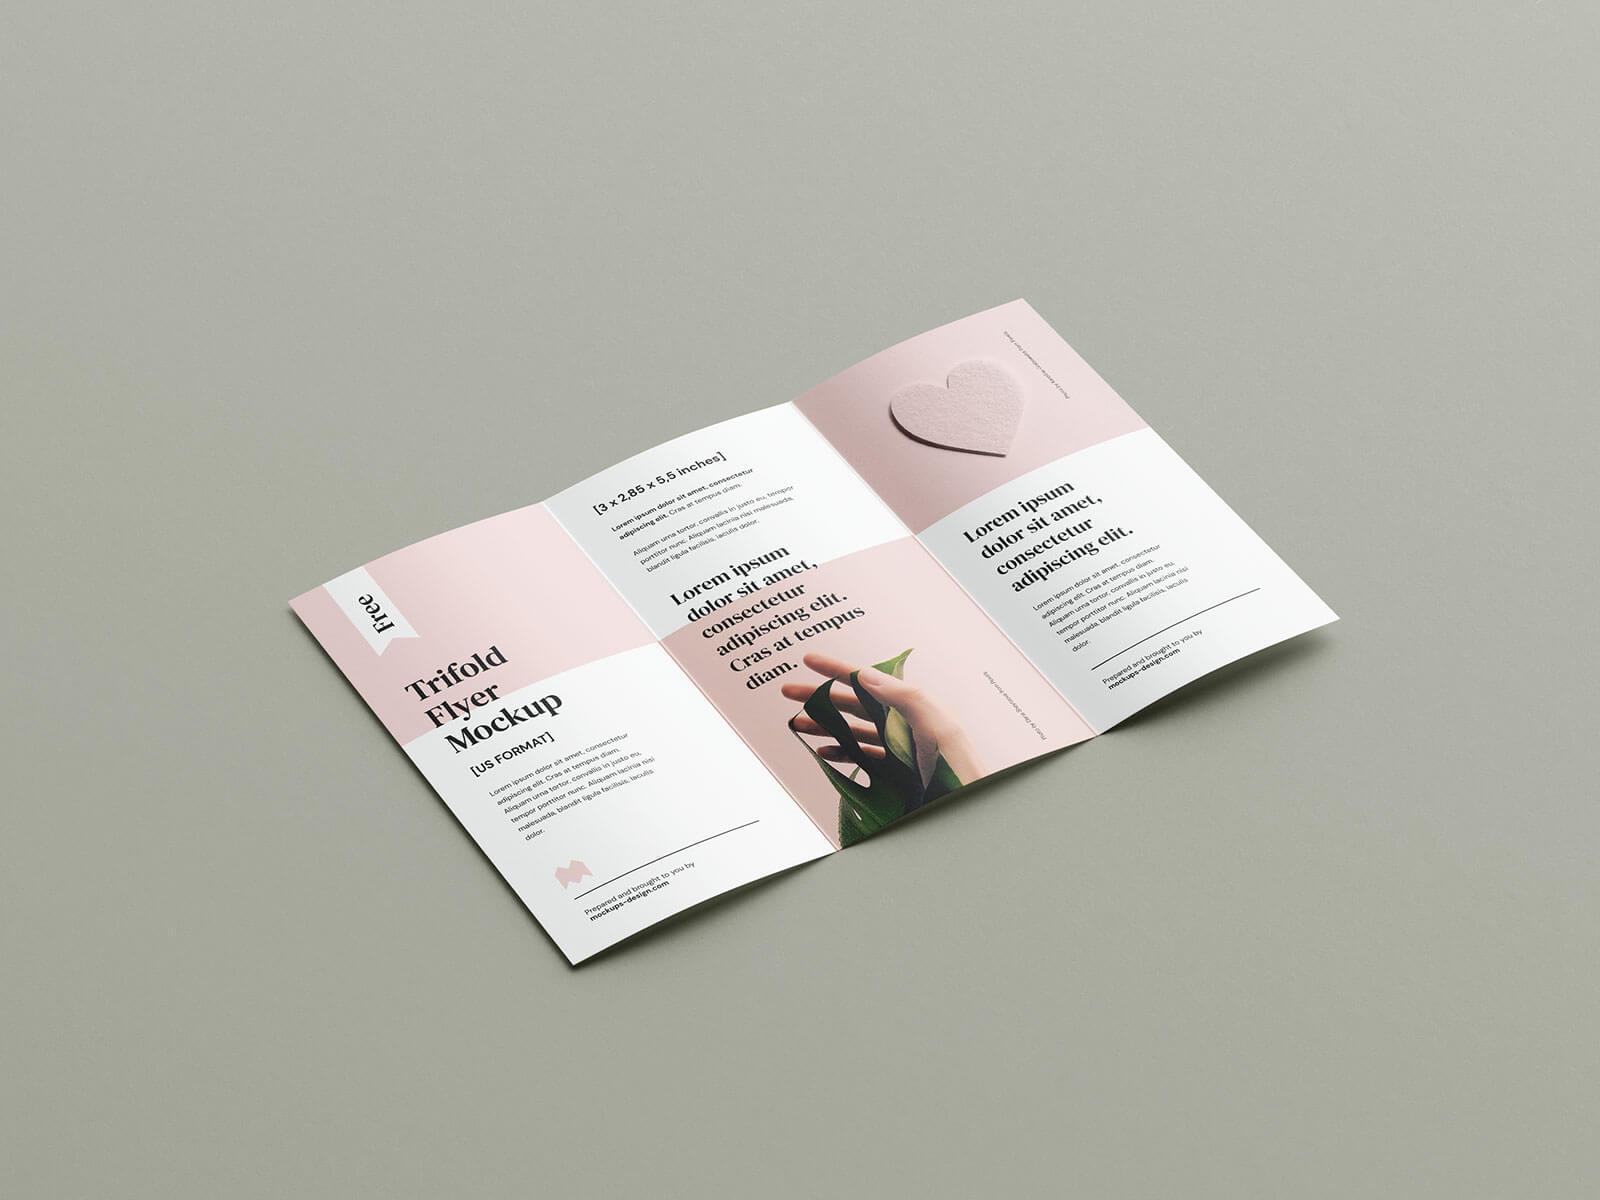 Free High Quality Bi-Fold Brochure Mockup PSD Set